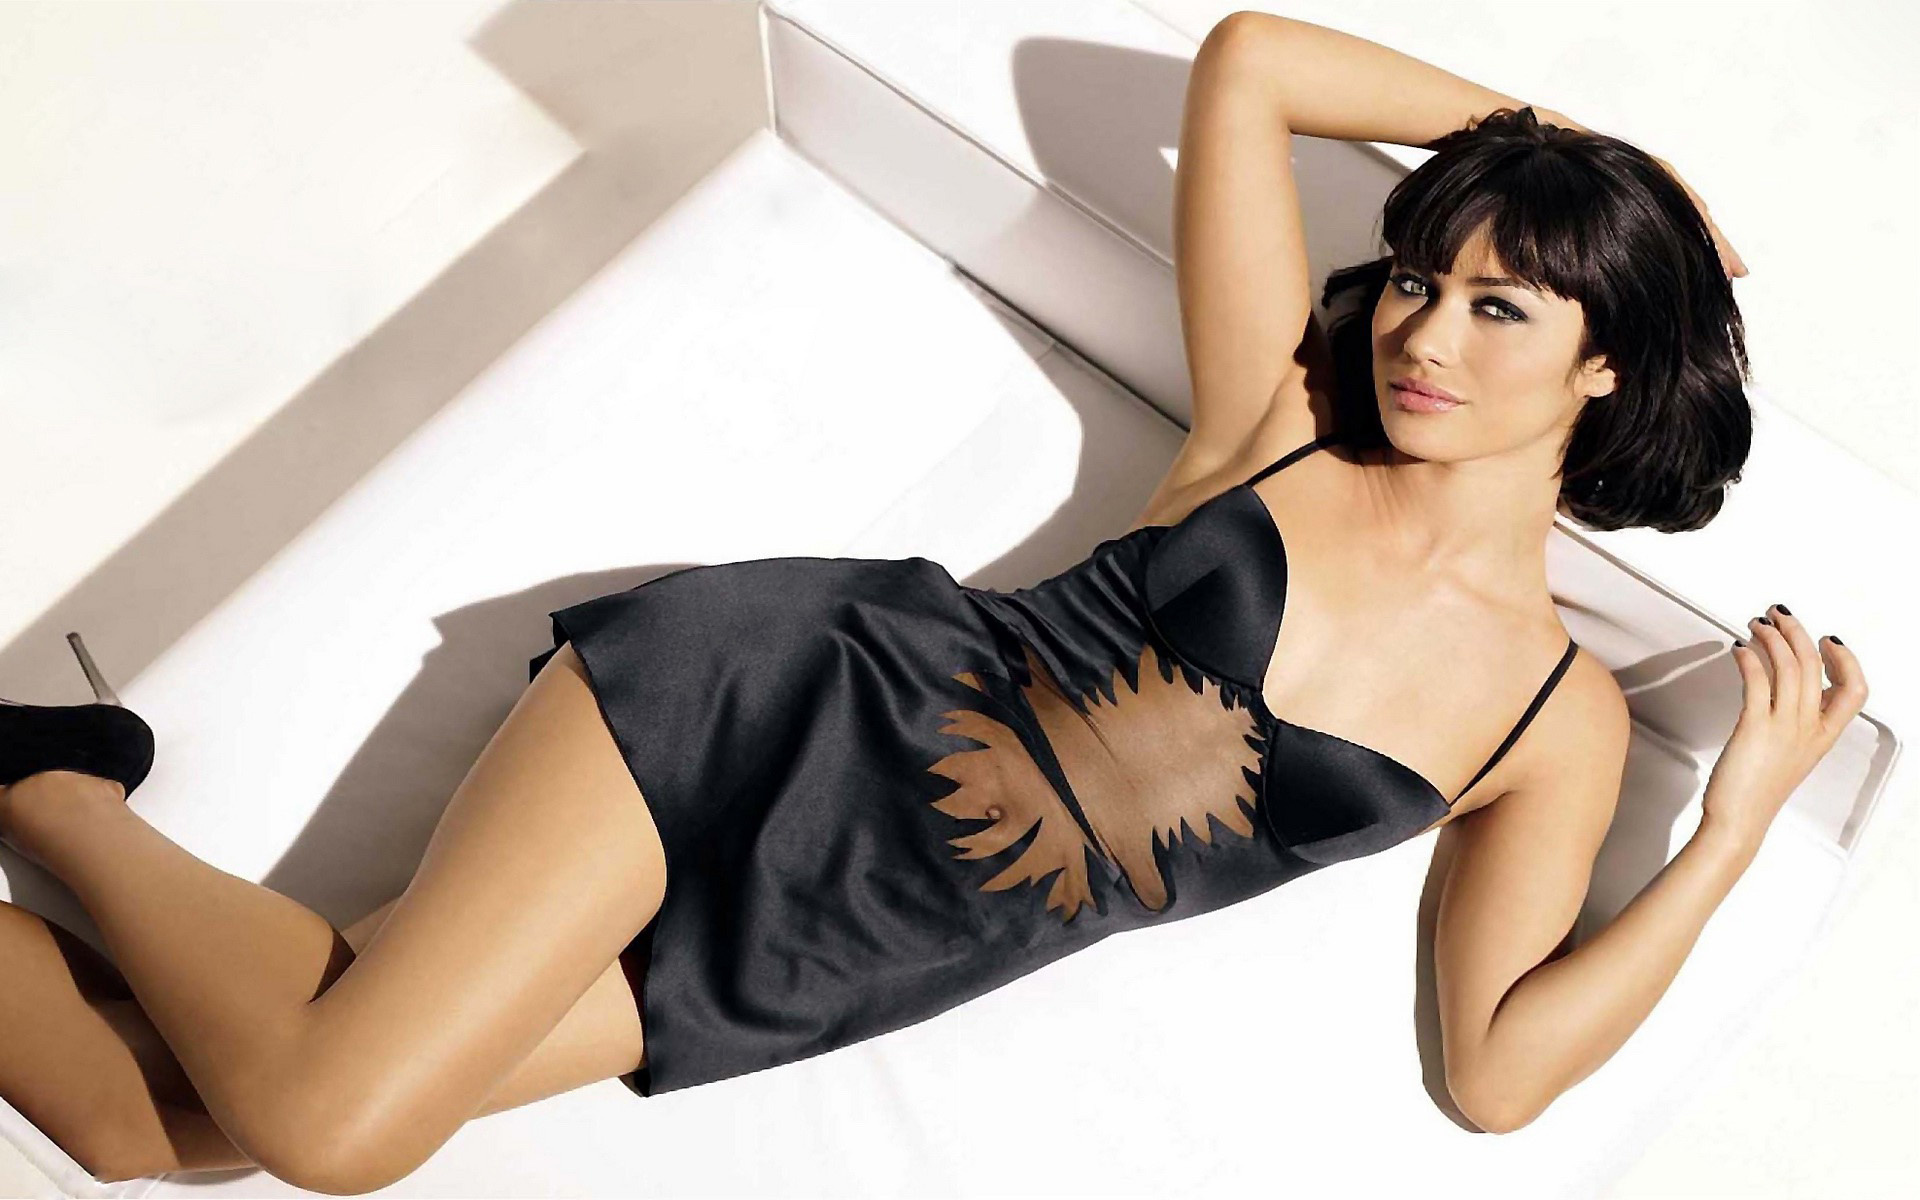 Olga Kurylenko model actress fashion glamour women females ... Olga Kurylenko